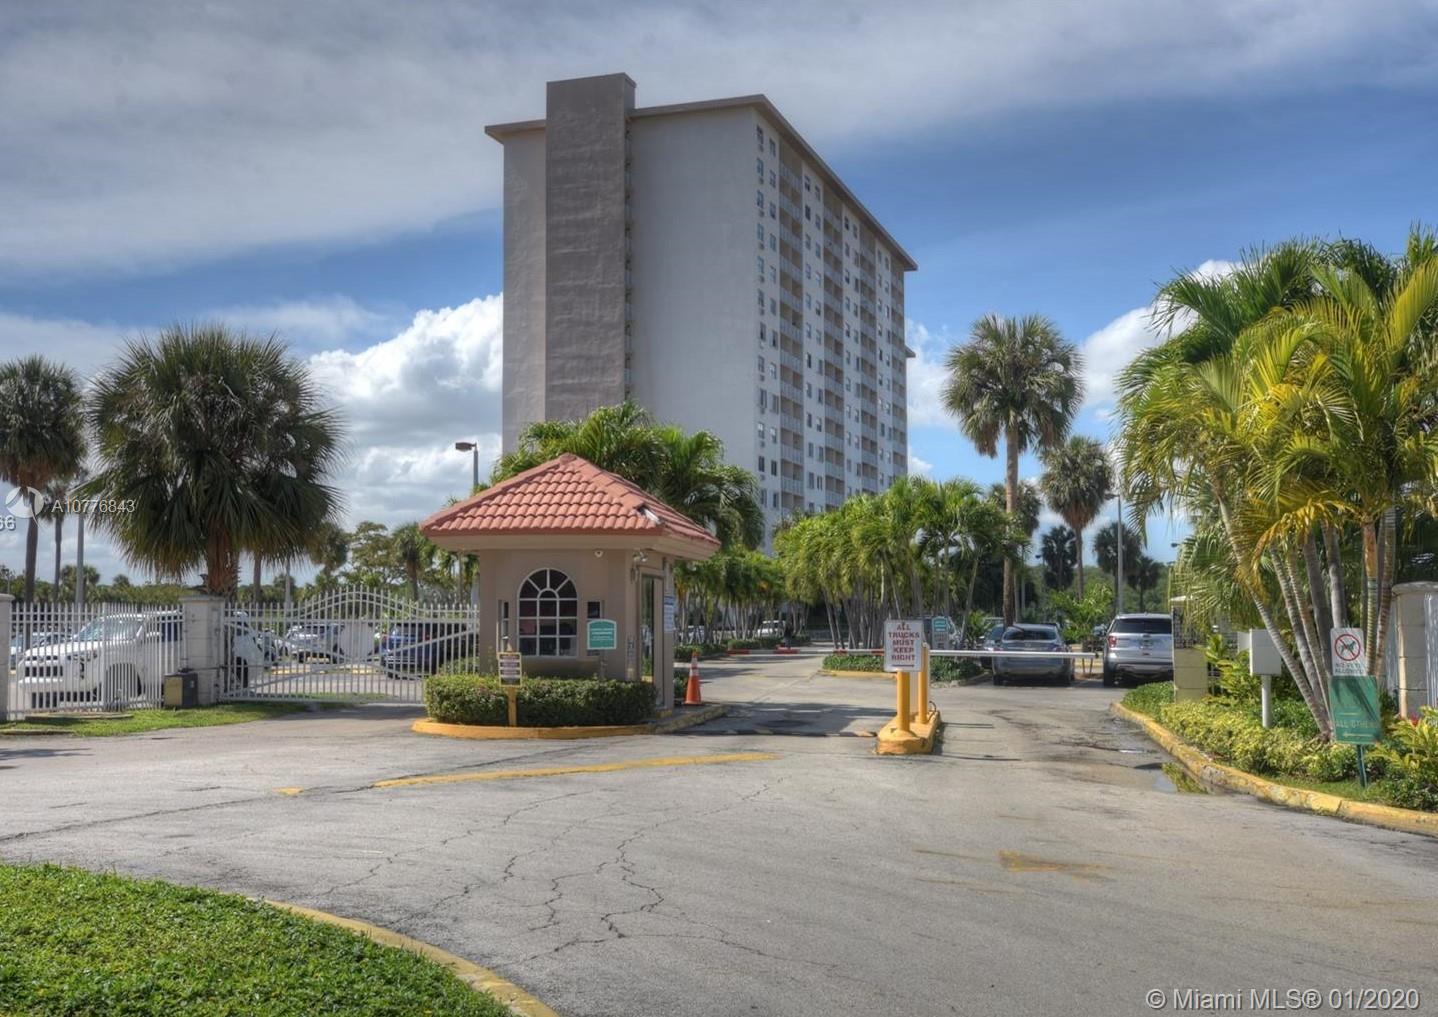 400 Kings Point Dr 415, Sunny Isles Beach, FL 33160